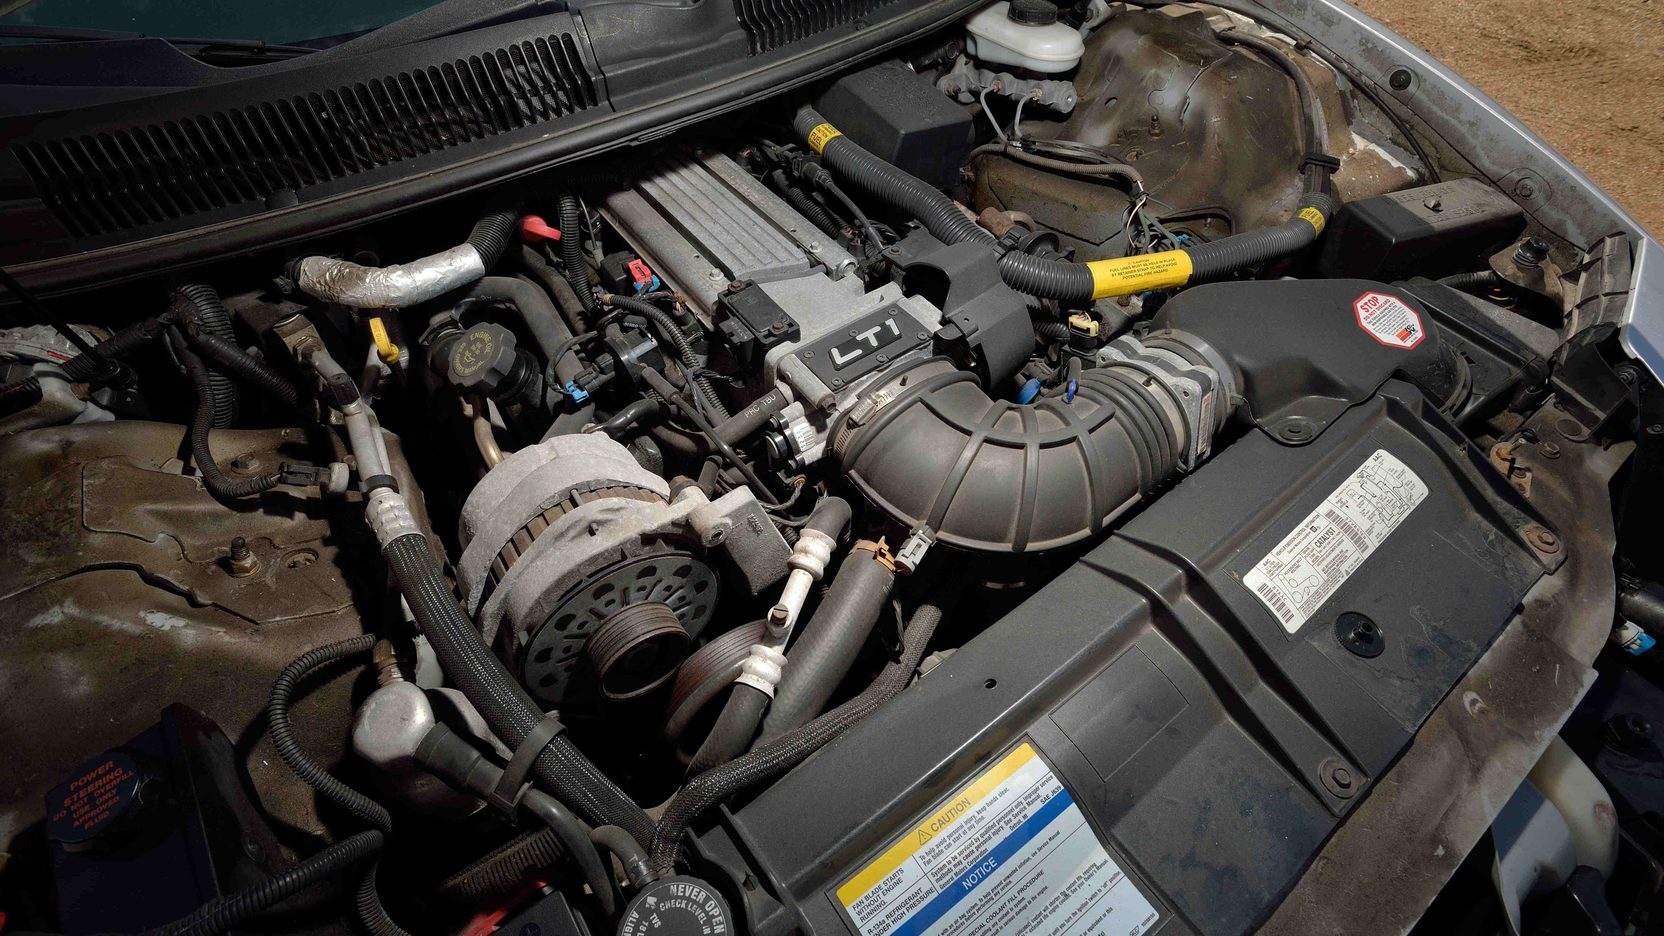 1997 Pontiac Firebird engine